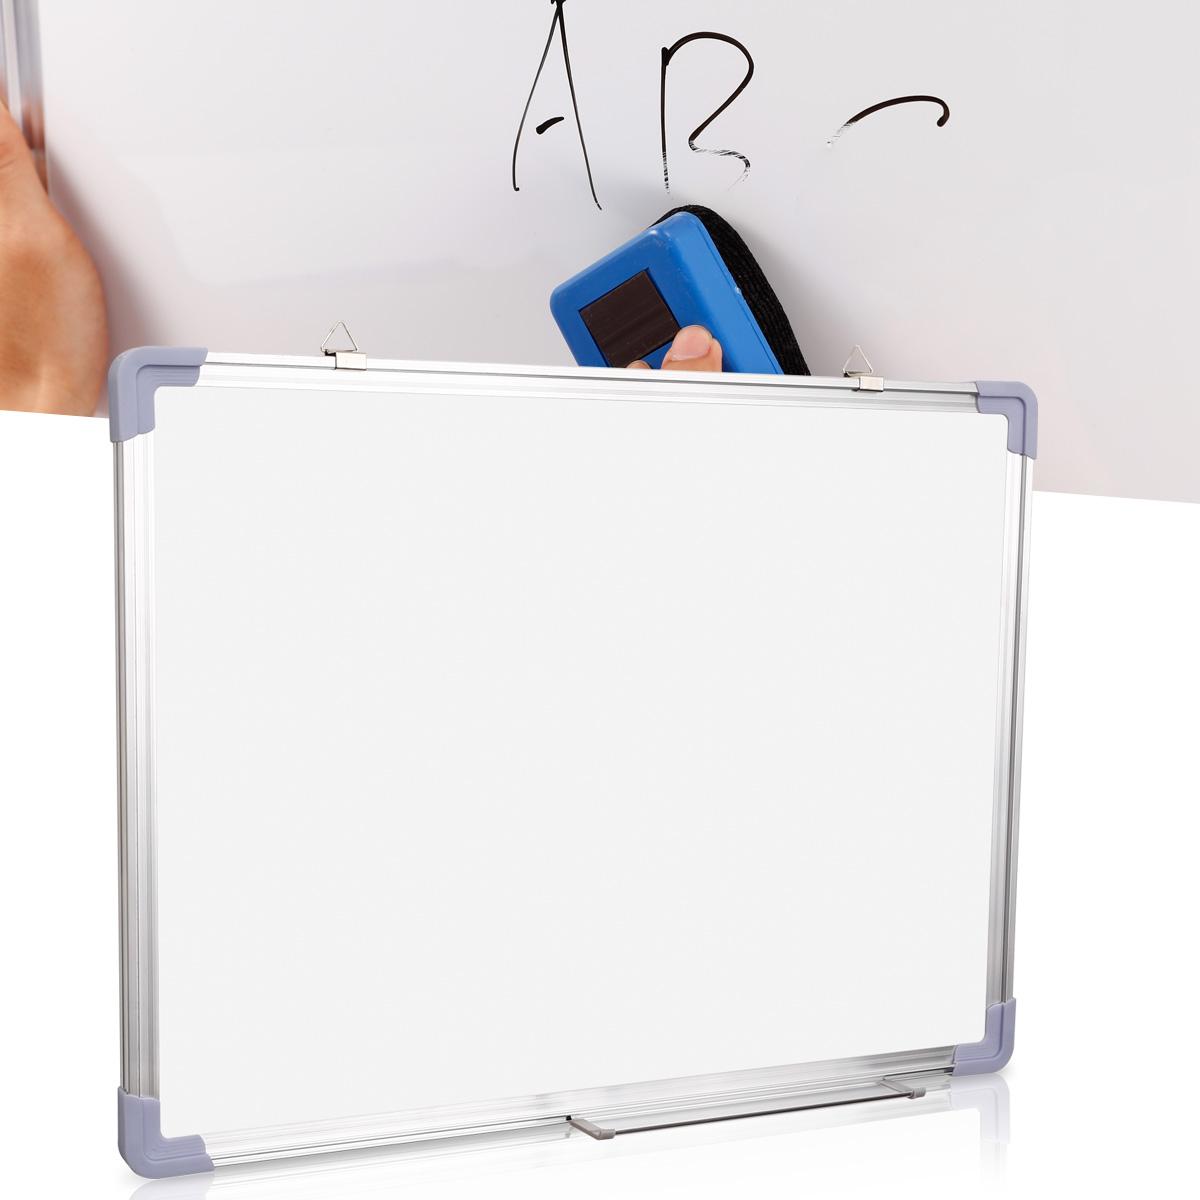 tableau blanc magnetique cadre aluminum ecriteau memo bureau stylo brosse aimant ebay. Black Bedroom Furniture Sets. Home Design Ideas